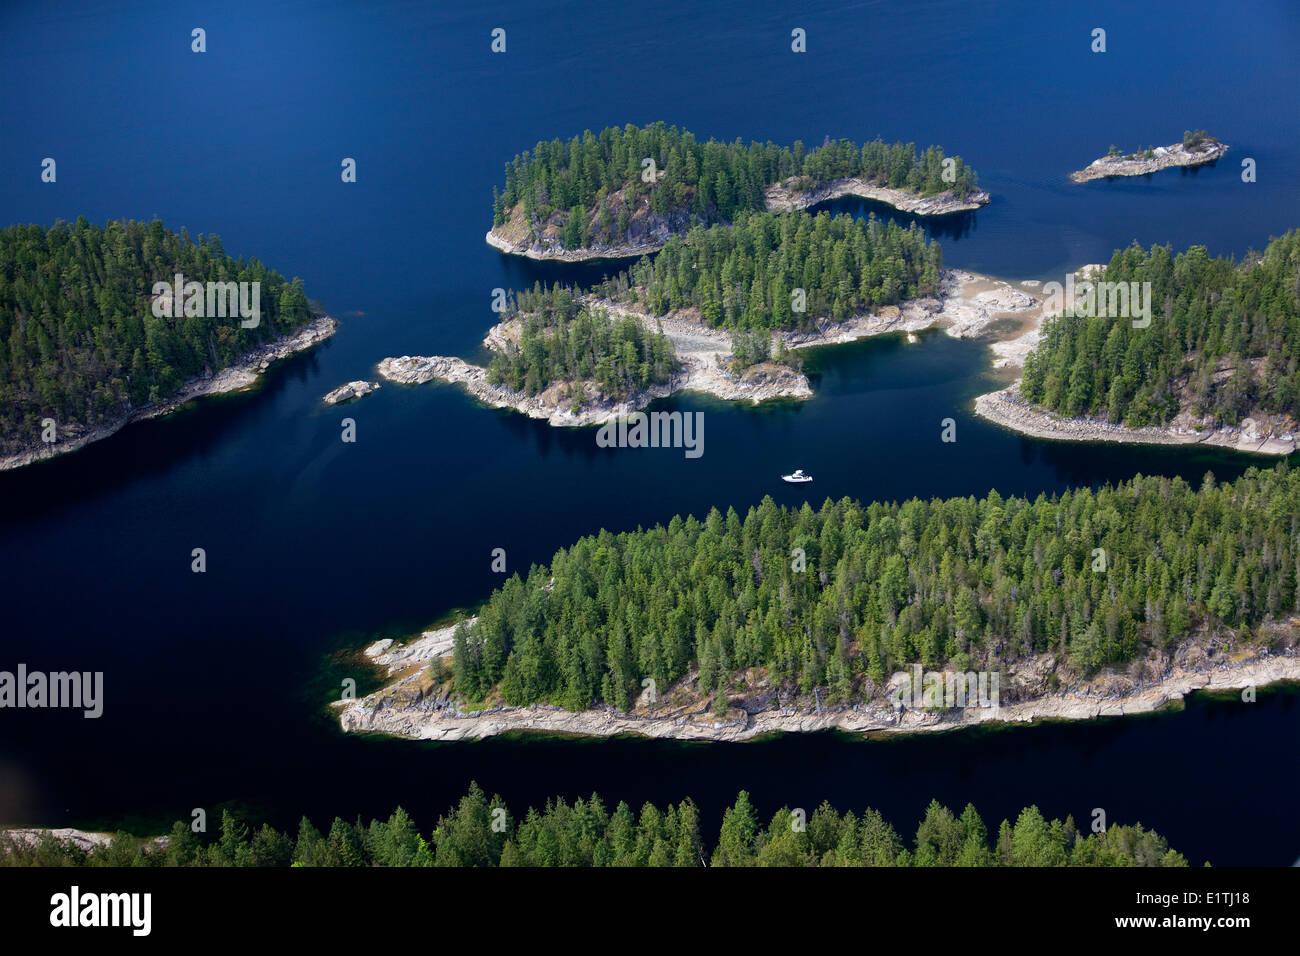 Prideaux Haven, Aerial, Boating, Summer, Desolation Sound Marine Provincial Park, Sunshine Coast, B.C., Canada - Stock Image